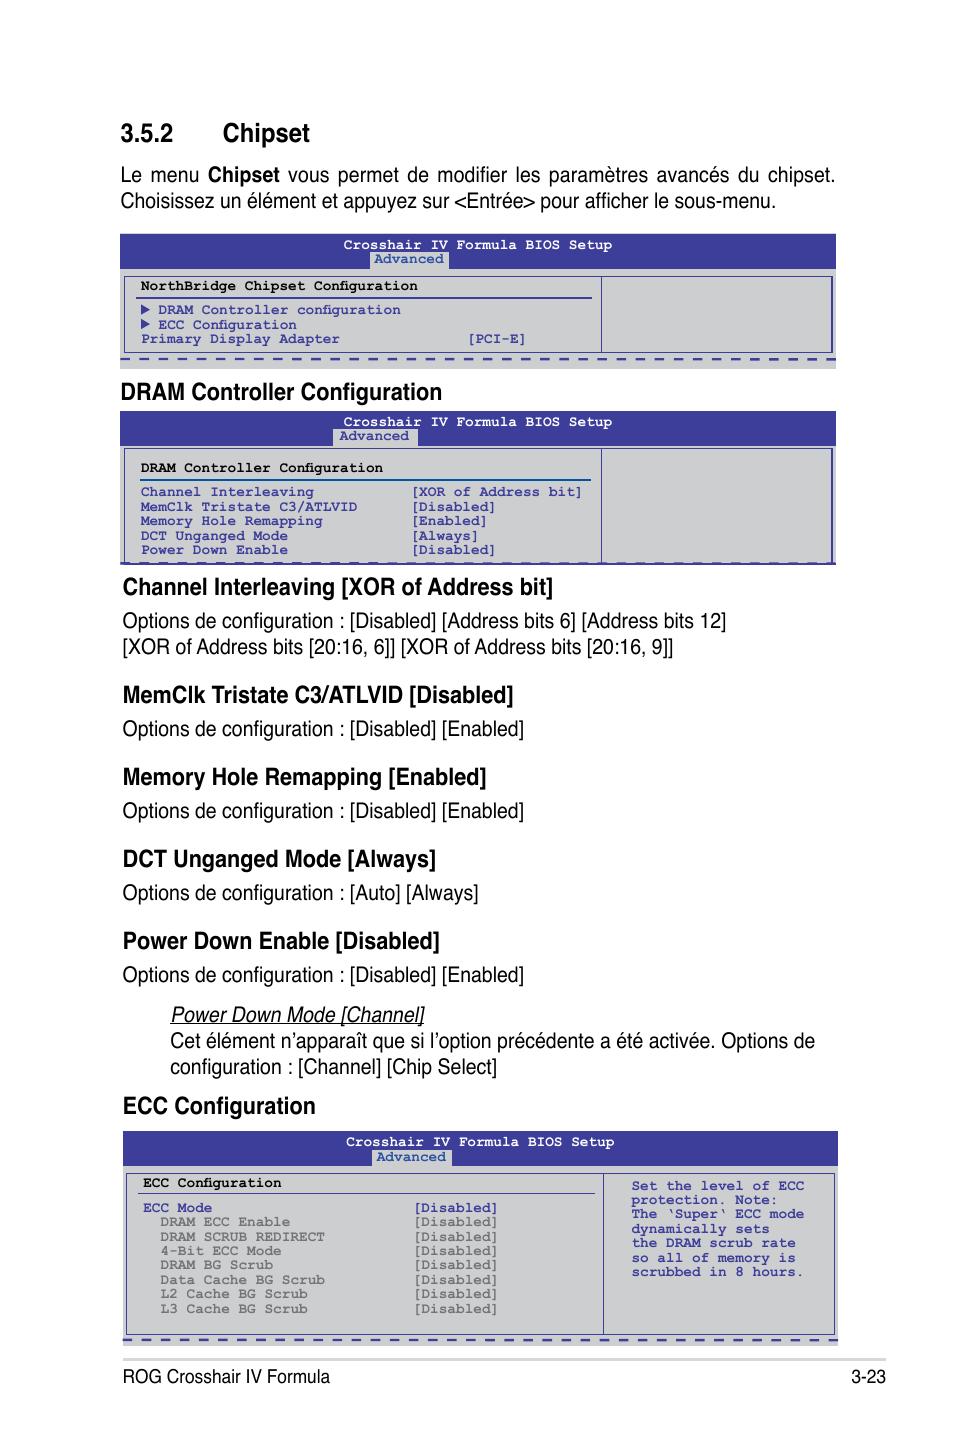 2 chipset, Dram controller configuration, Channel